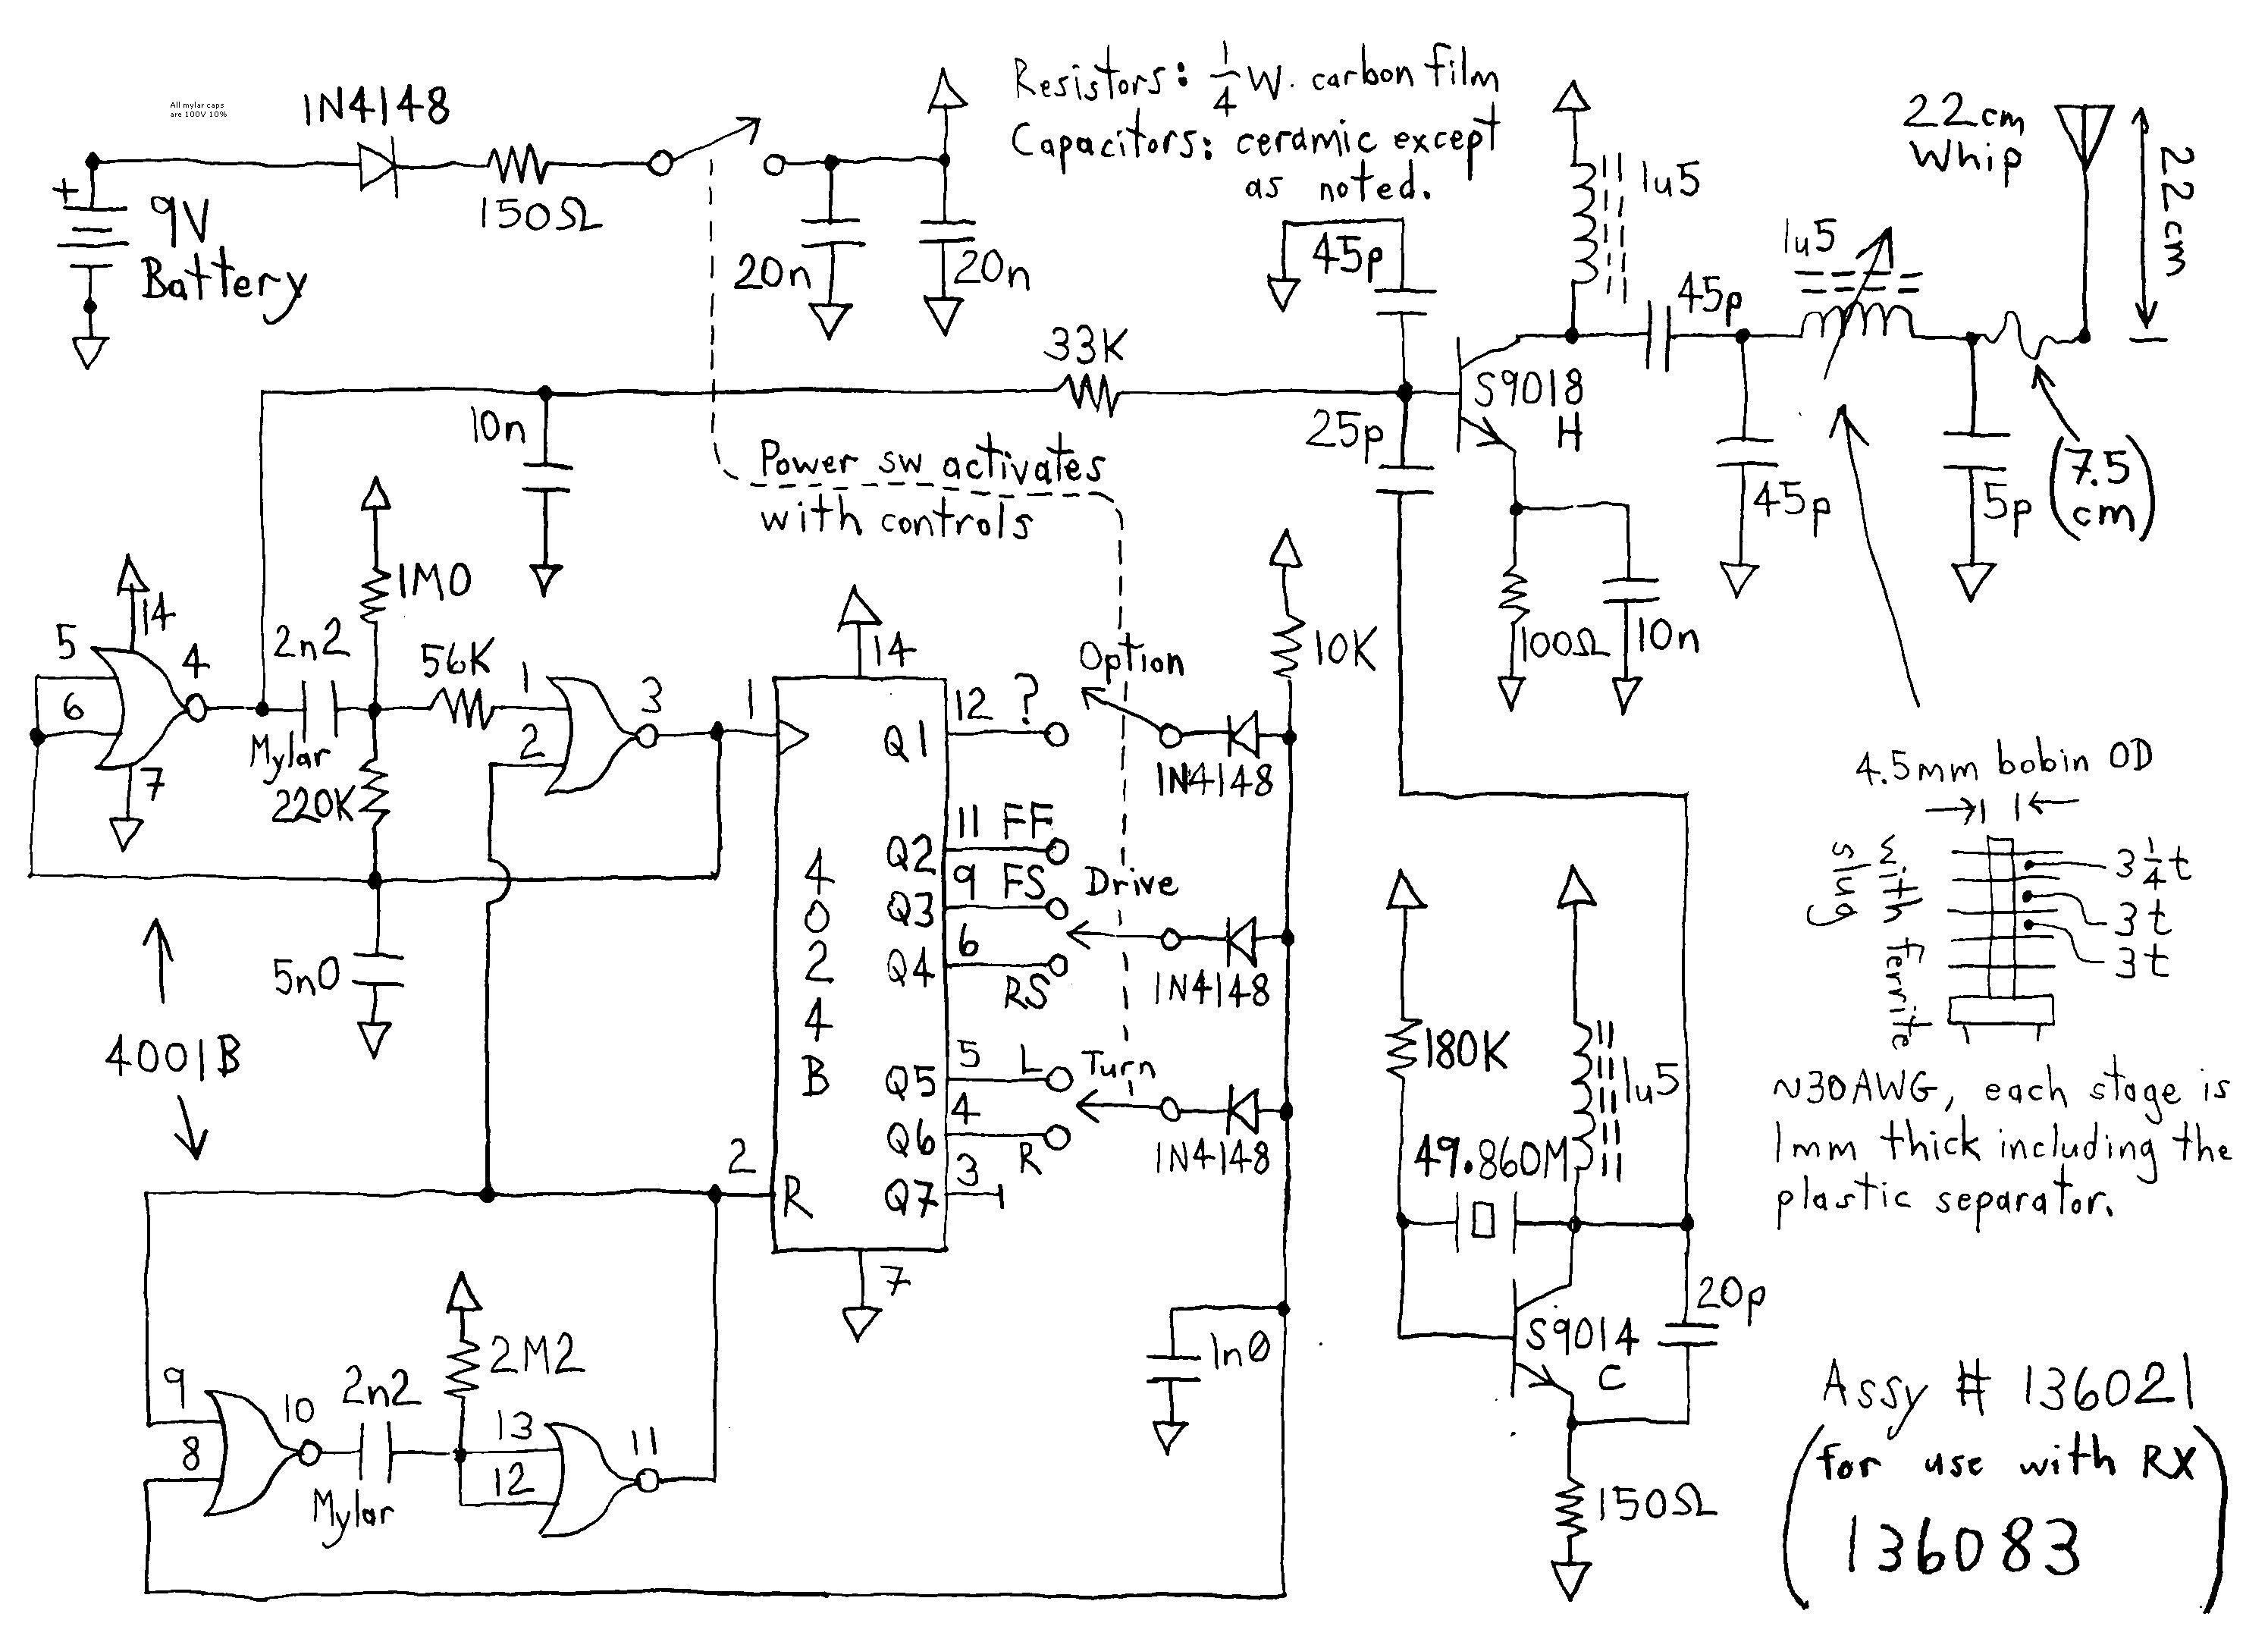 Unique Reading Electrical Drawings Diagram Wiringdiagram Diagramming Diagramm Visuals Visuali Electrical Wiring Diagram Electrical Diagram Diagram Design